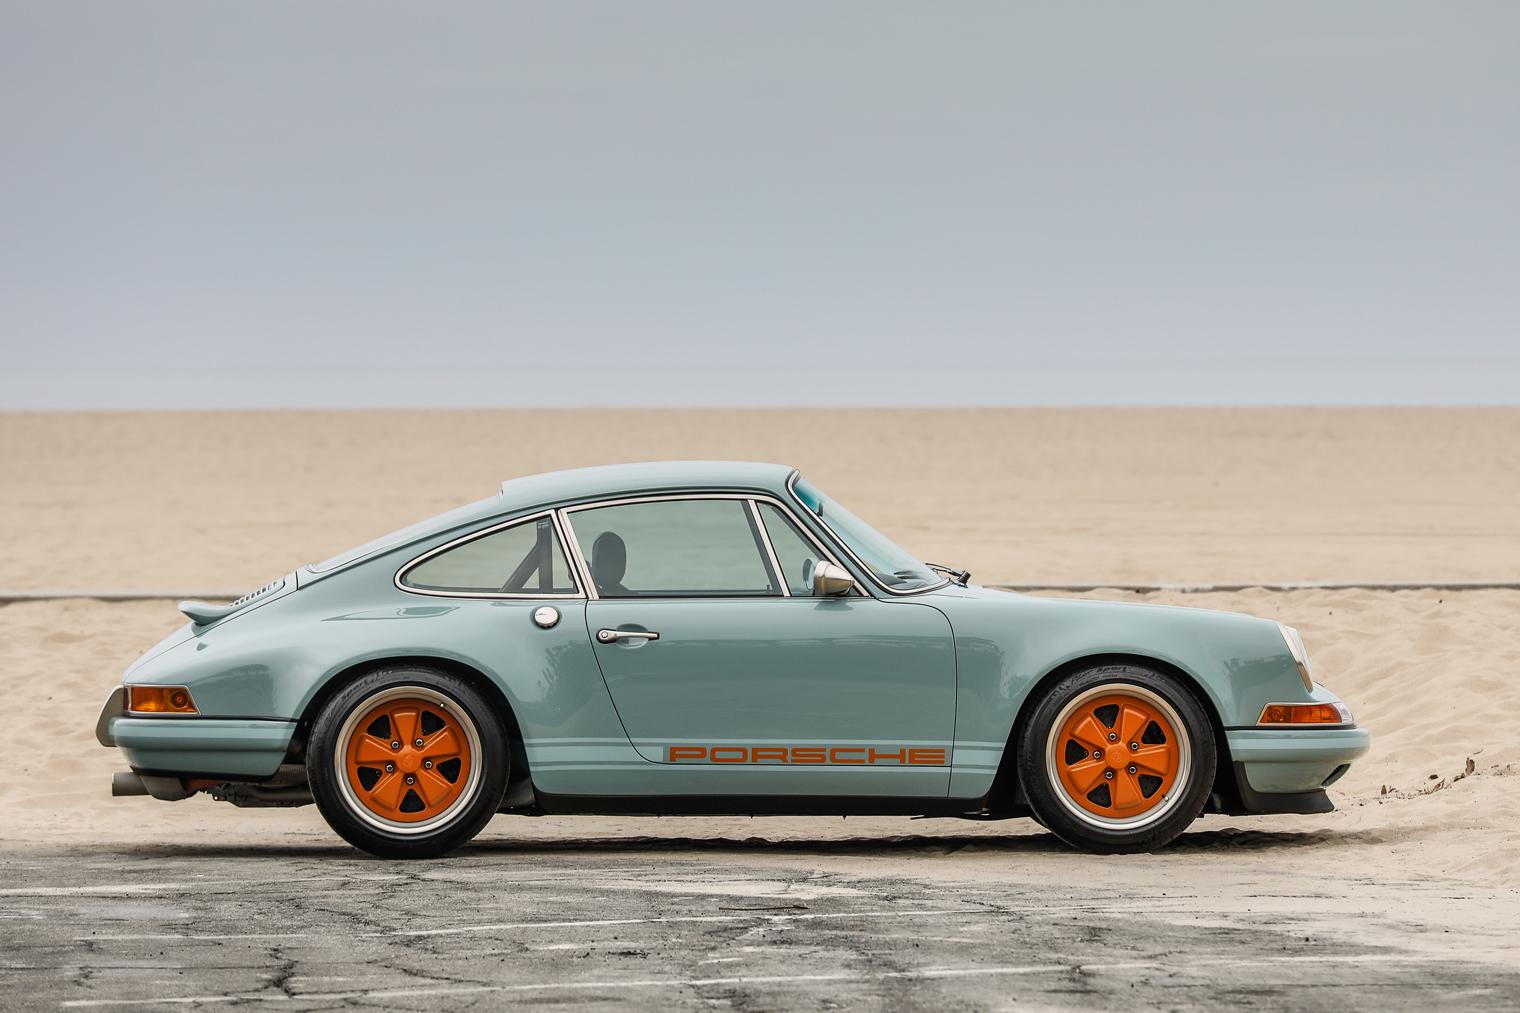 1991_Porsche_911_Singer_Rust_and_Glory_4